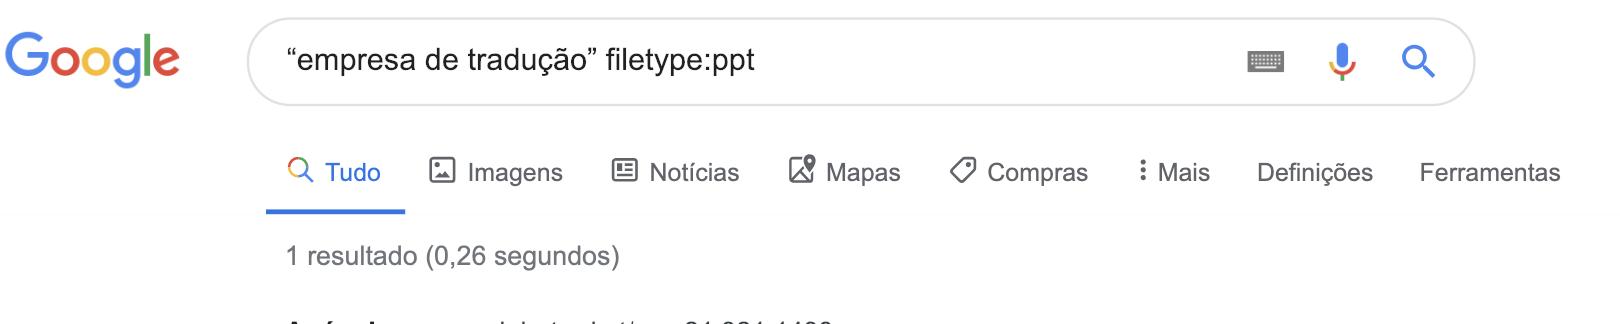 pesquisa-google-arquivos